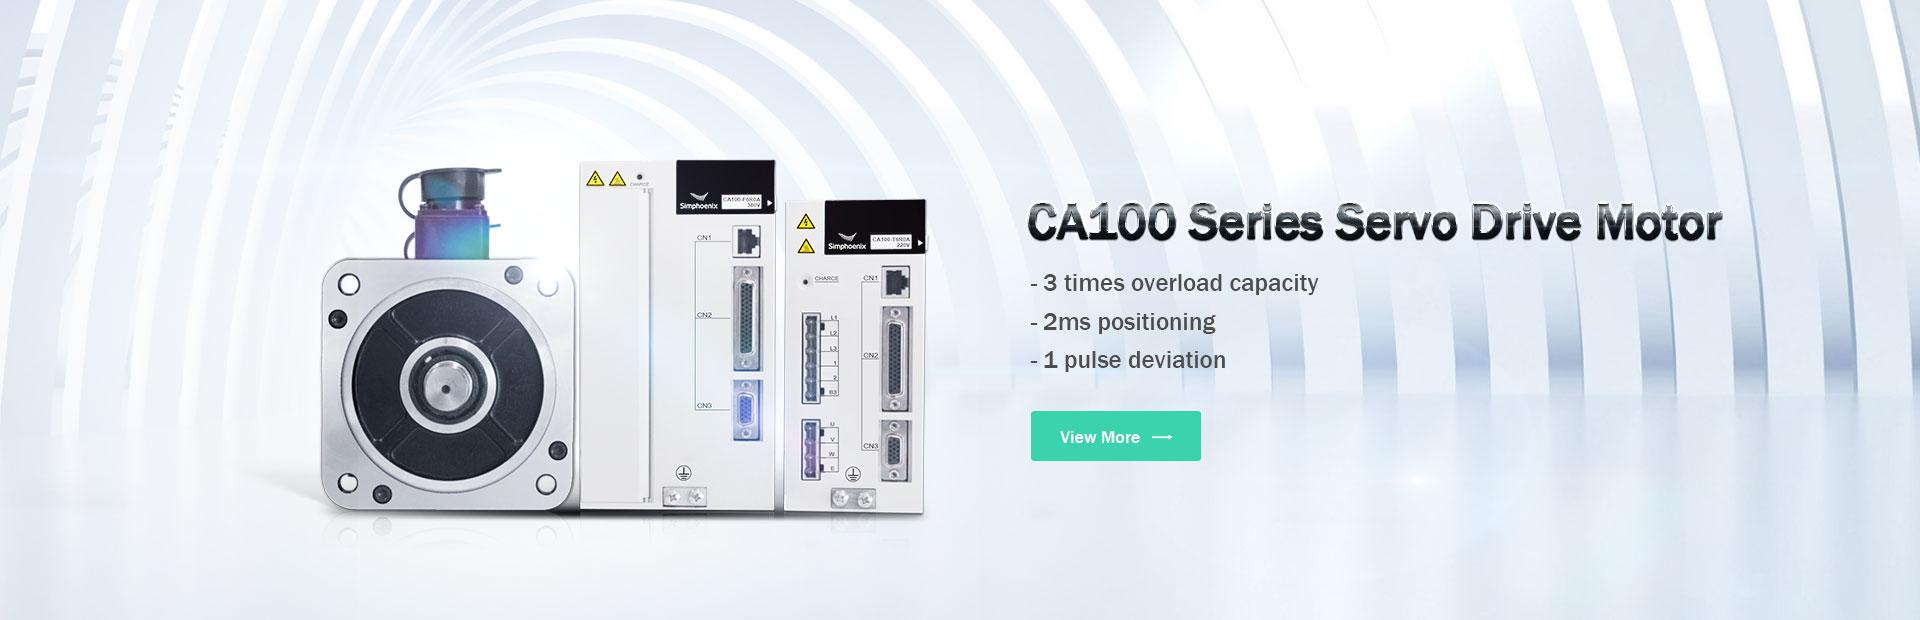 CA100-Series-Servo-Drive-Motor1